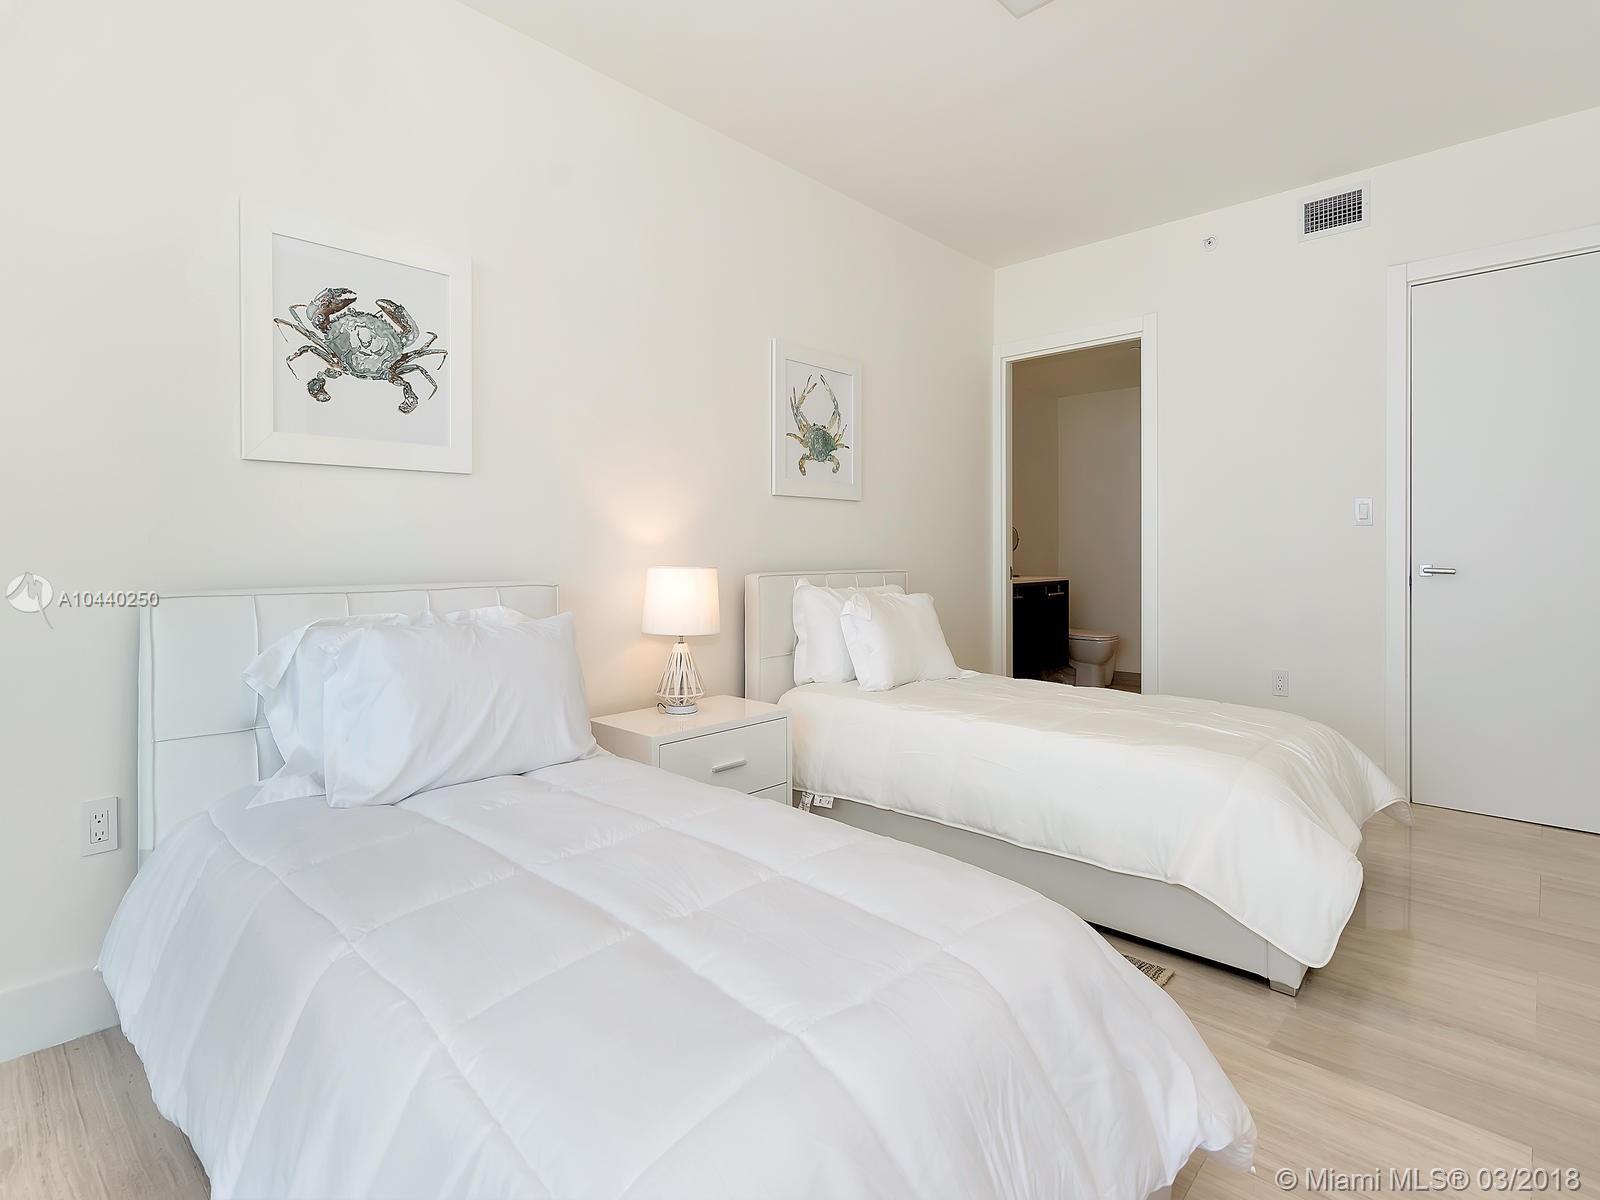 Homes for Sale in Zip Code 33131